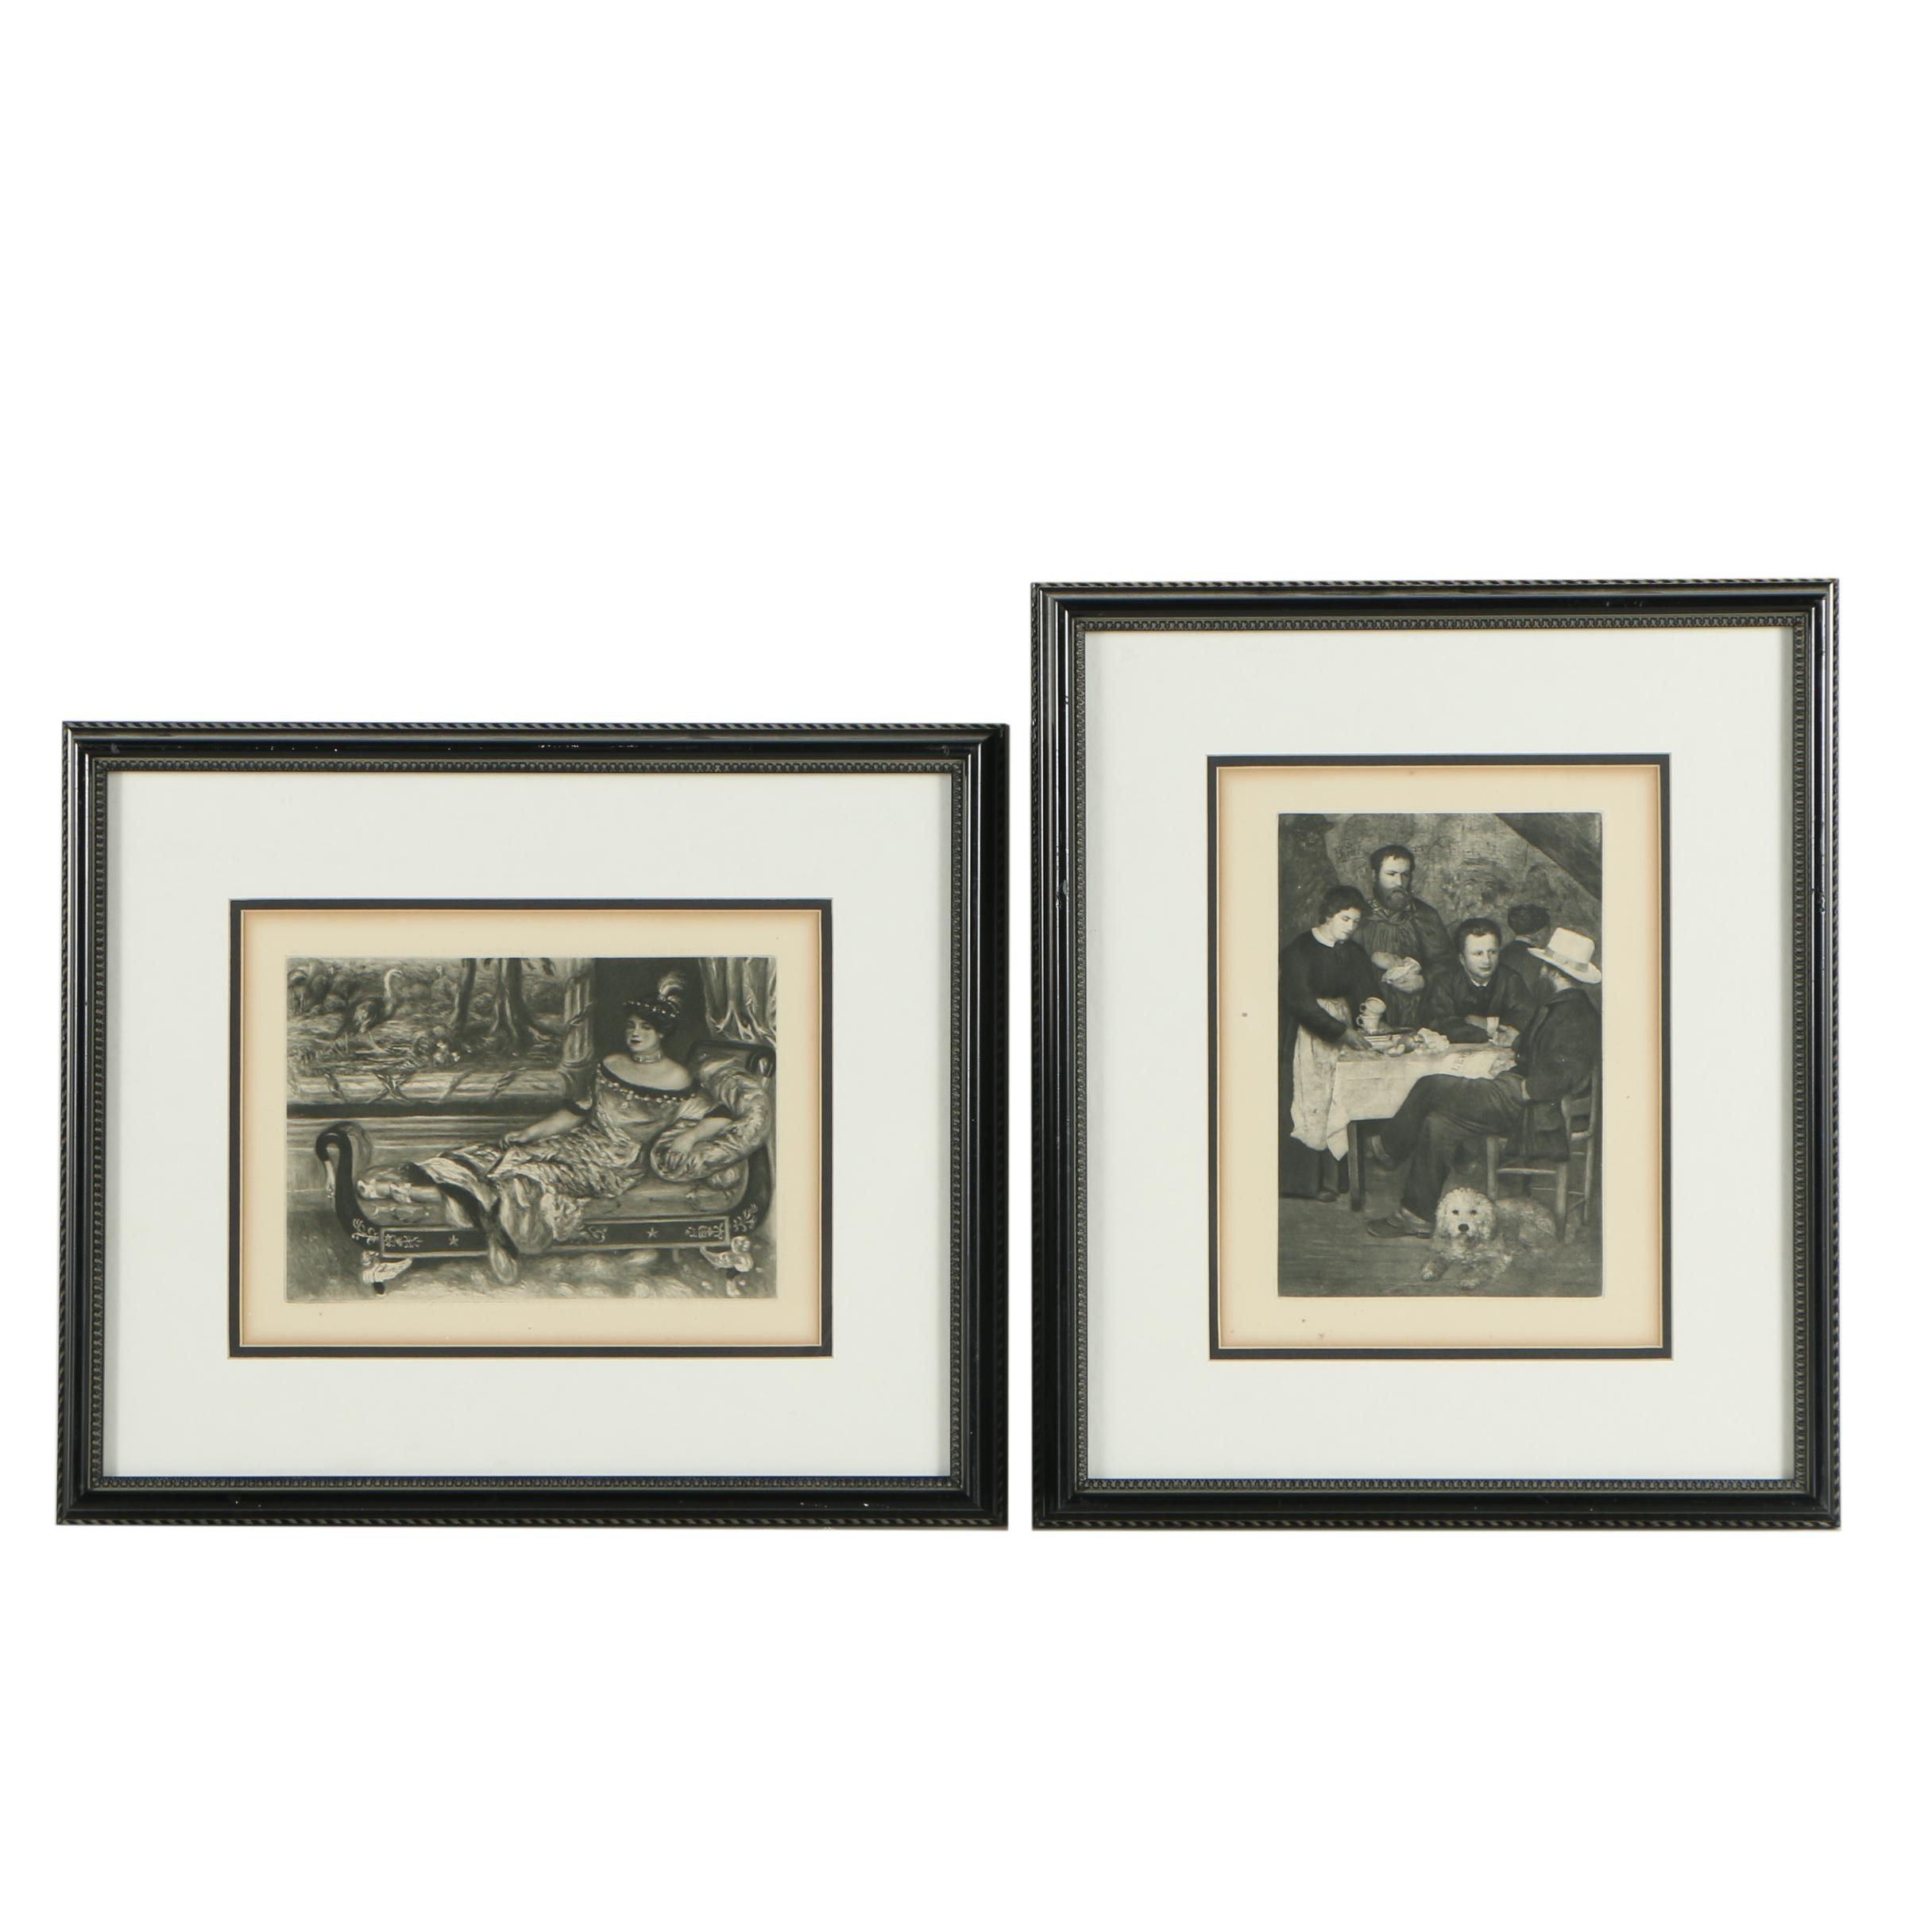 Heliogravure Prints after Renoir